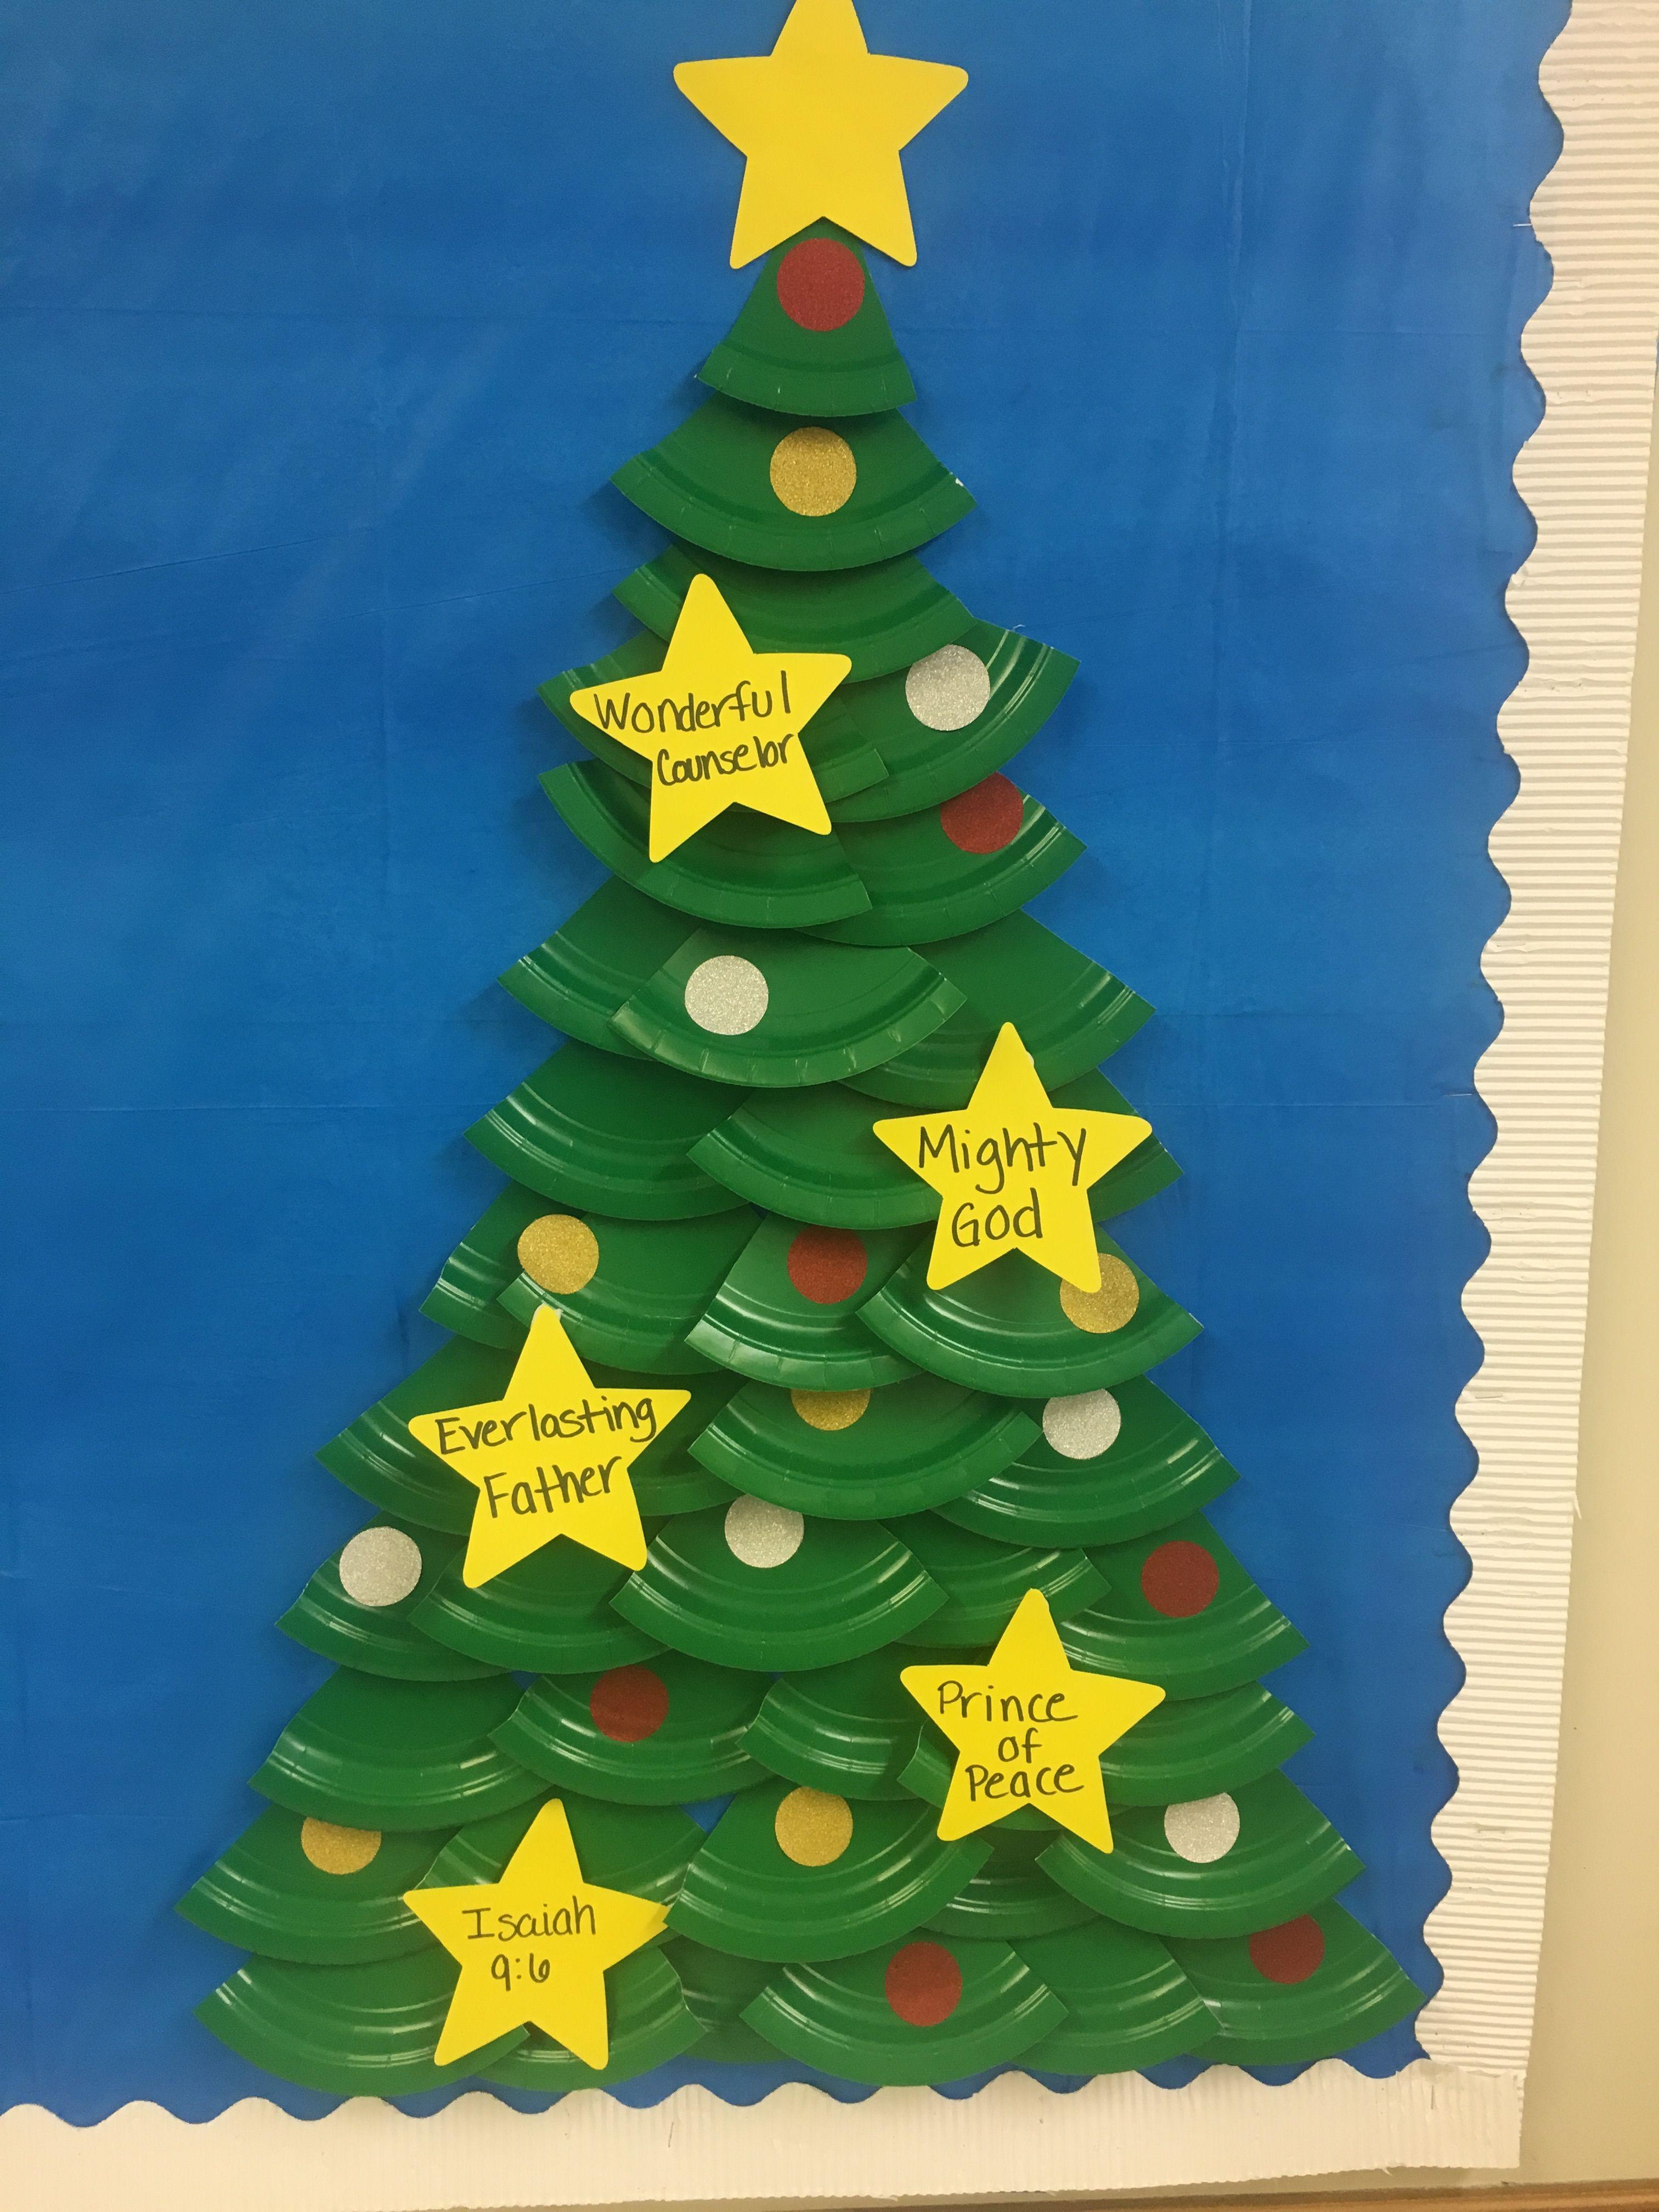 My Christmas 2017 Church Bulletin Board Used Paper Plates For The Christmas Tree Christmas Bulletin Christmas Sunday School Christmas Bulletin Boards